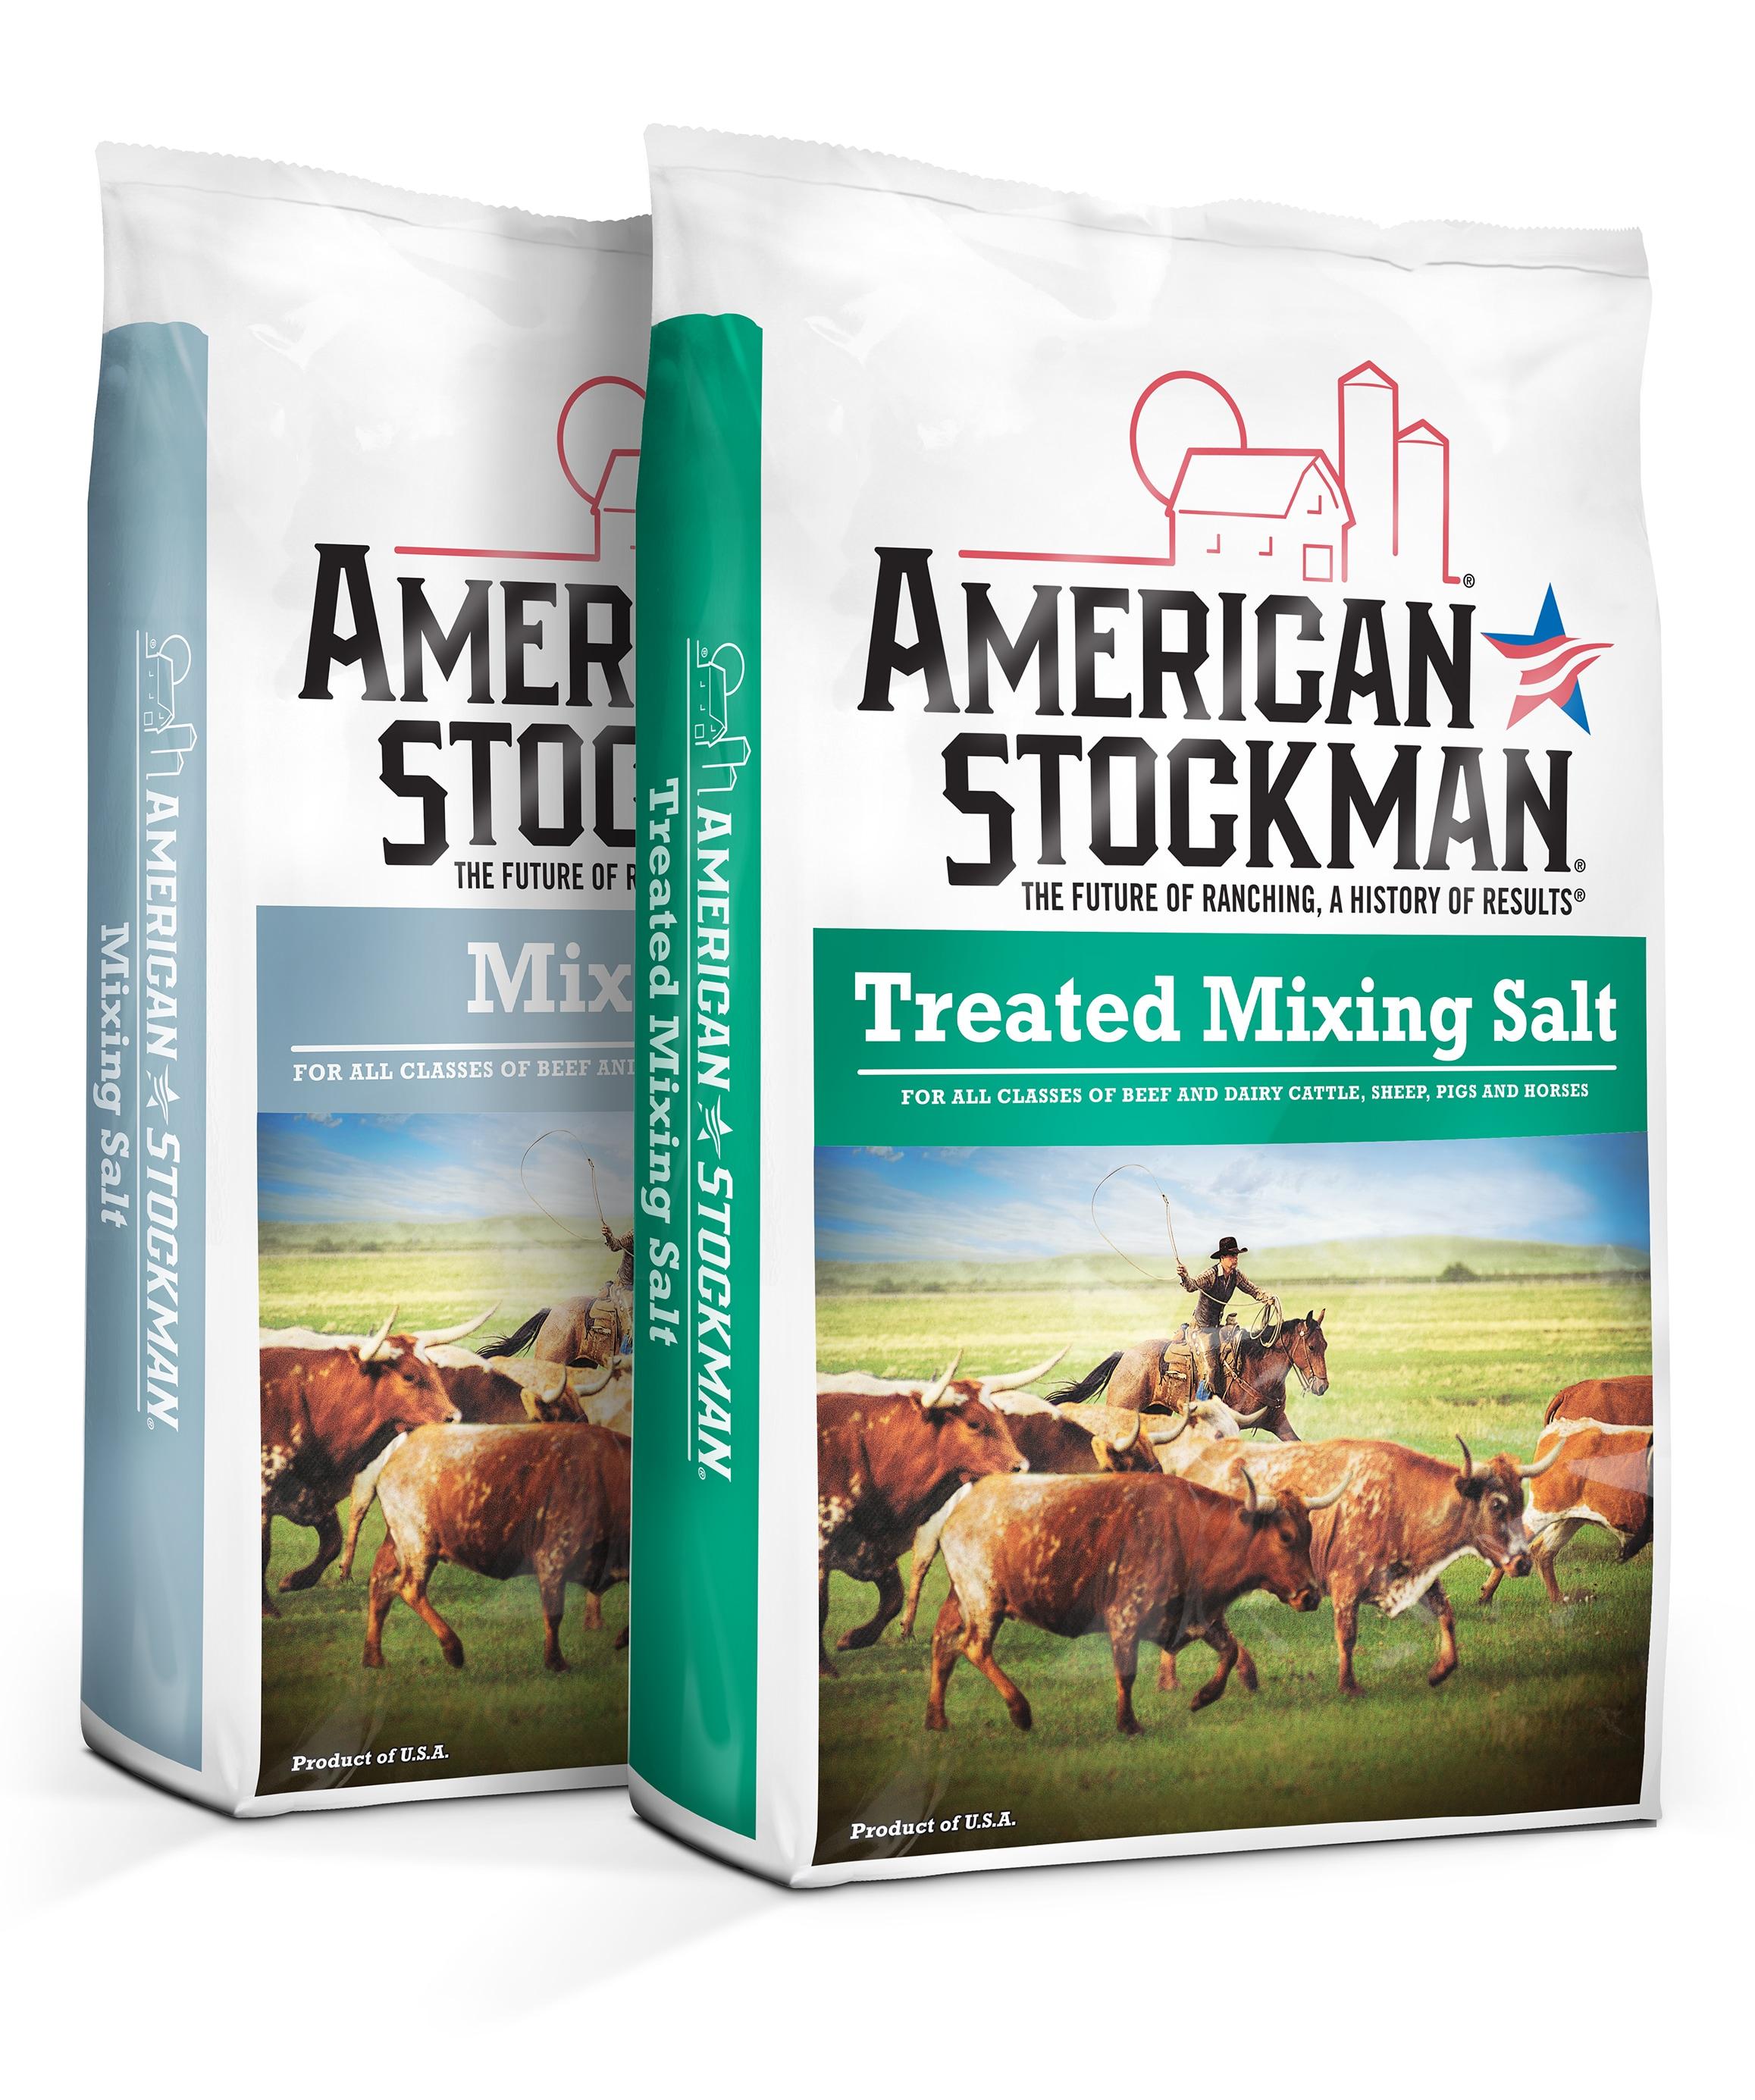 American Stockman® Mixing Salt and American Stockman® Treated Mixing Salt bags